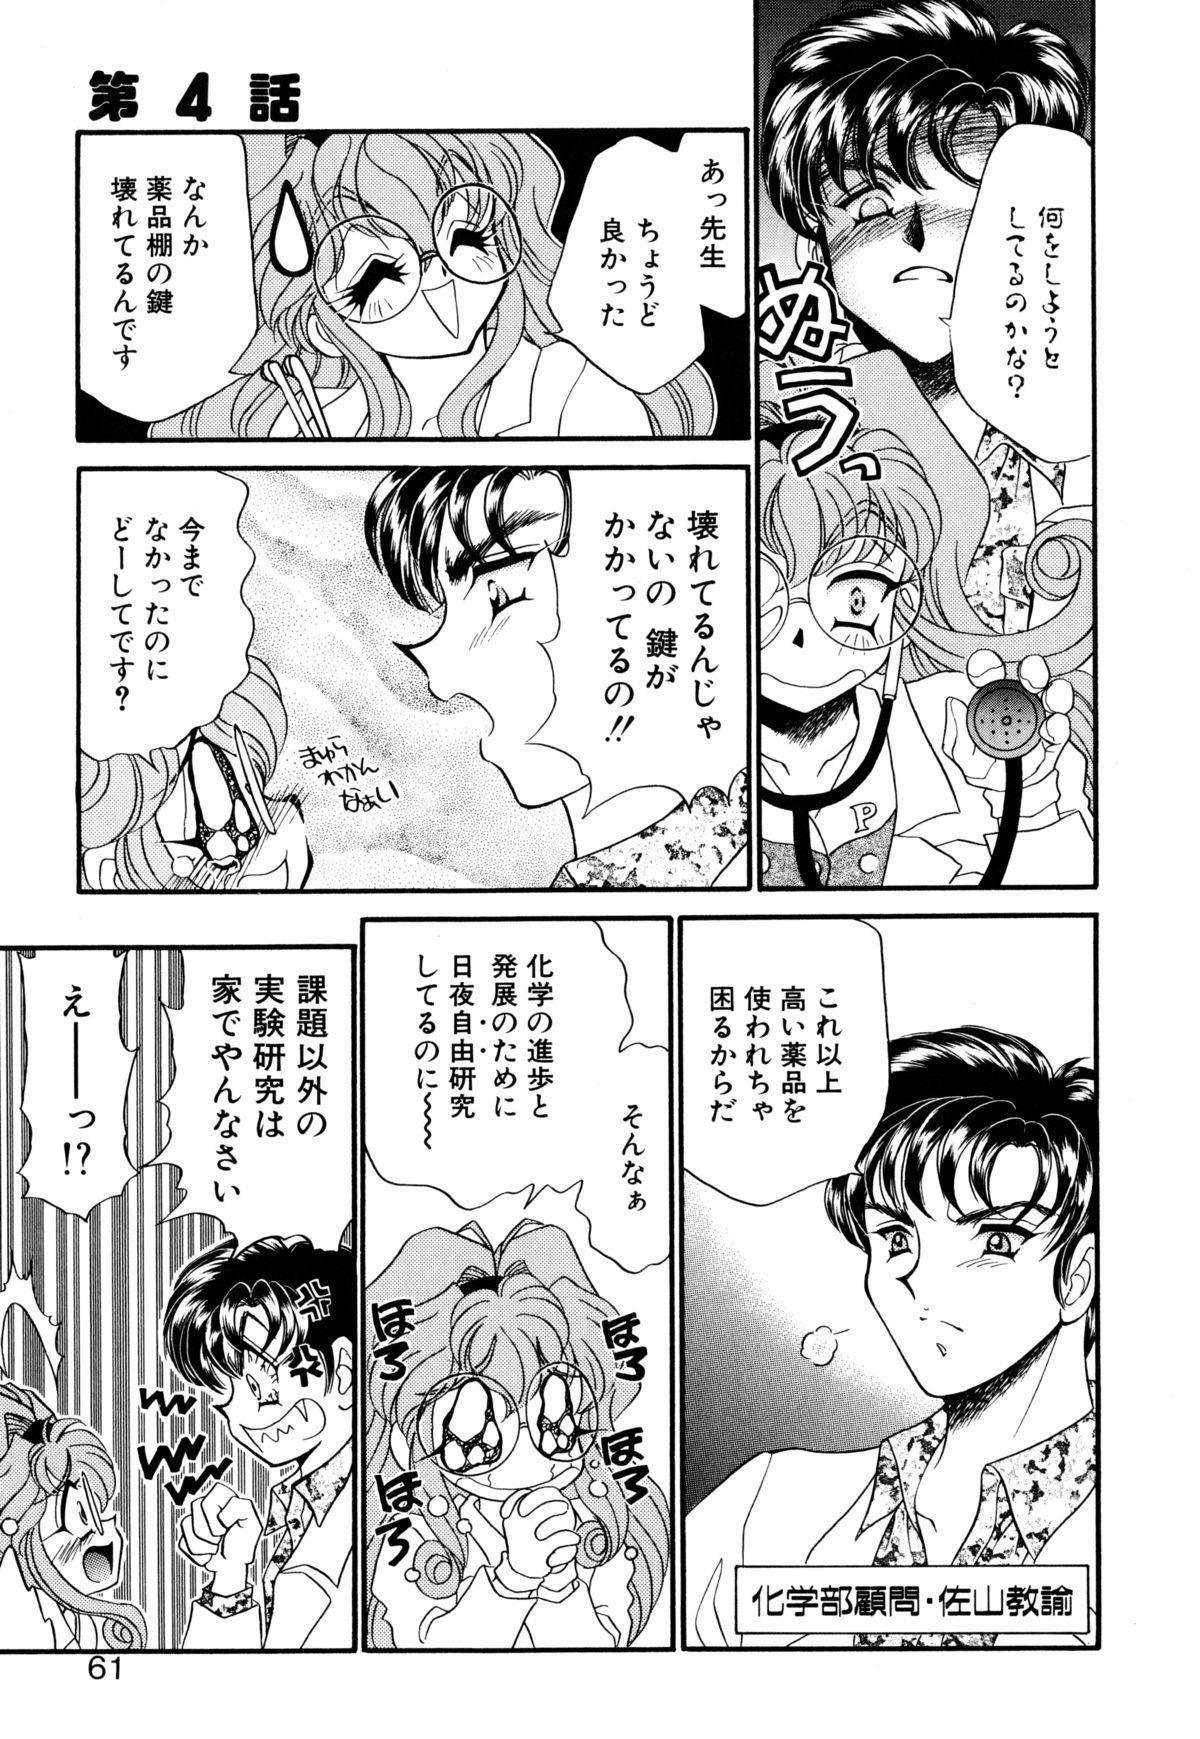 Kigurumi Sentai Quiltian 59